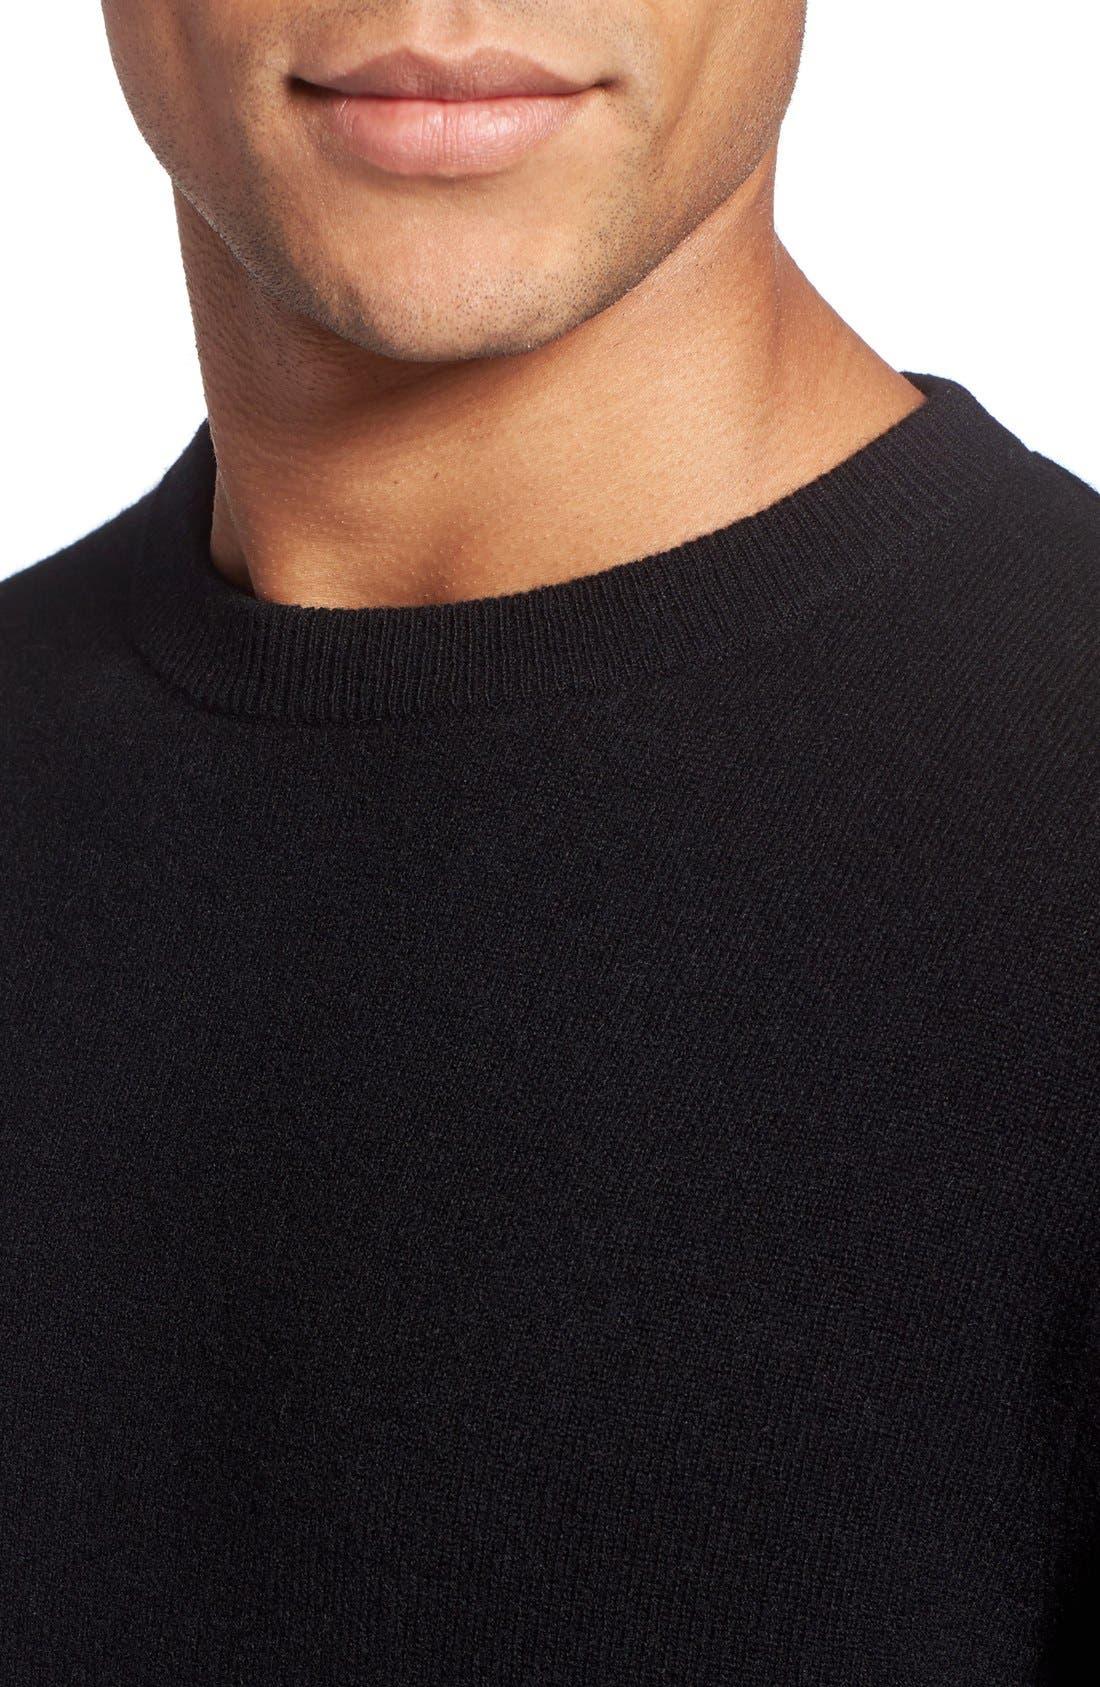 Cashmere Crewneck Sweater,                             Alternate thumbnail 4, color,                             BLACK CAVIAR